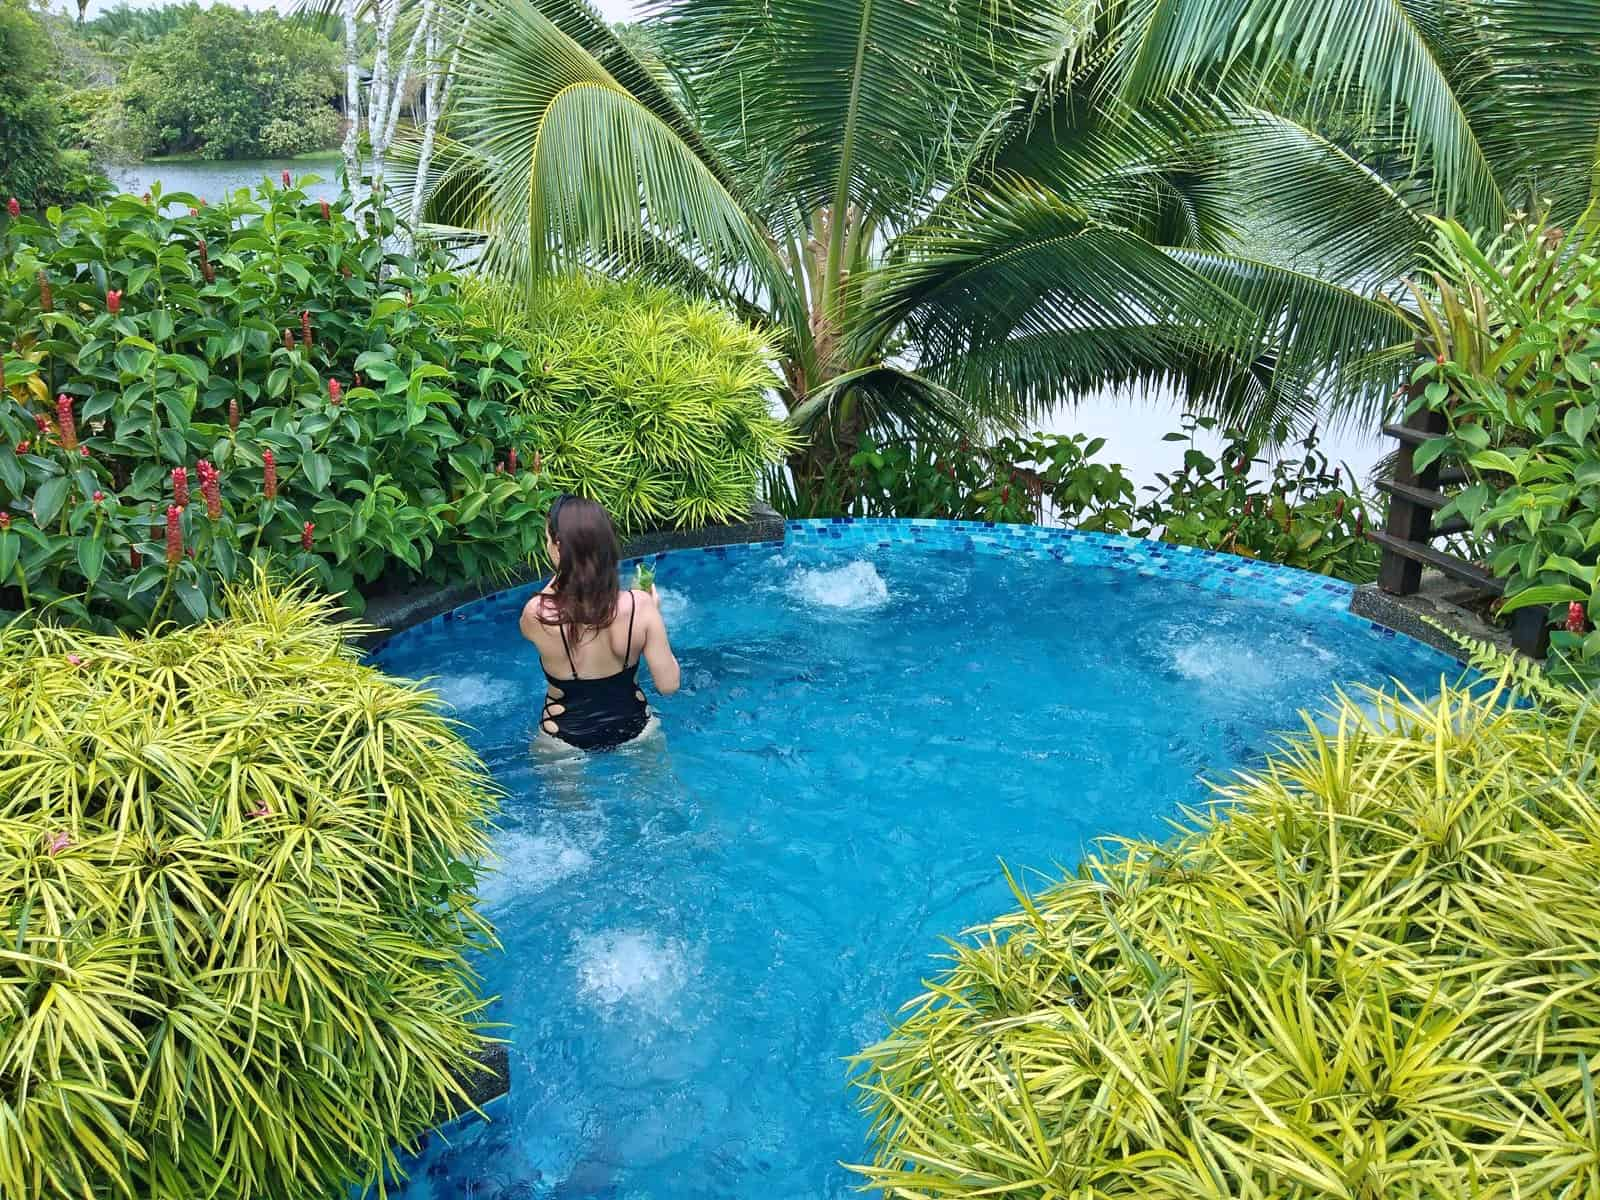 mangala-Resort-and-spa-gambang-malaysia-Travel-Mermaid-23